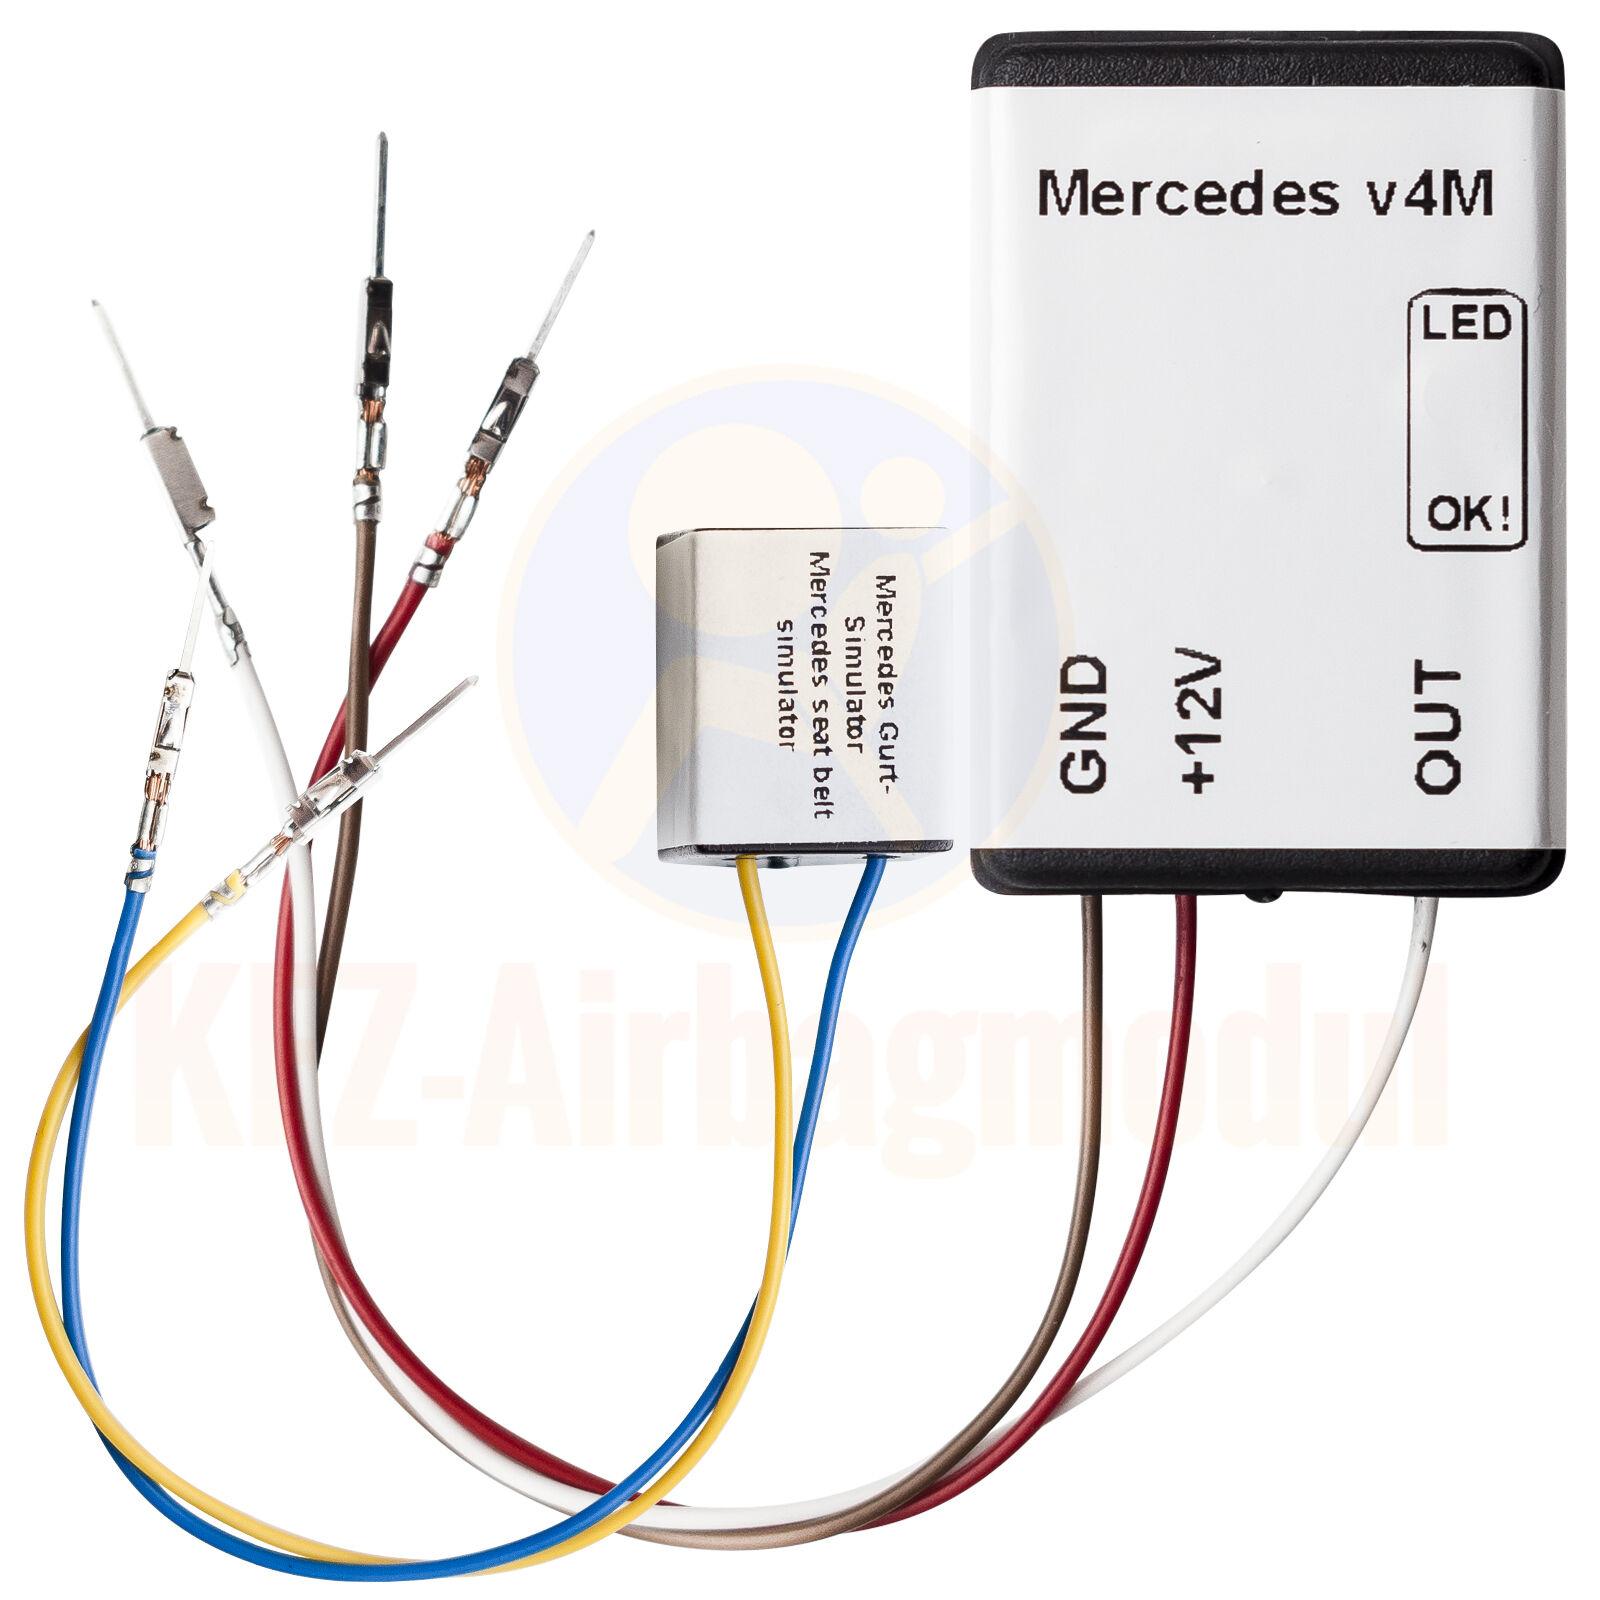 Seat Occupancy Detector Mercedes C W204 2007+ Seat Sensor